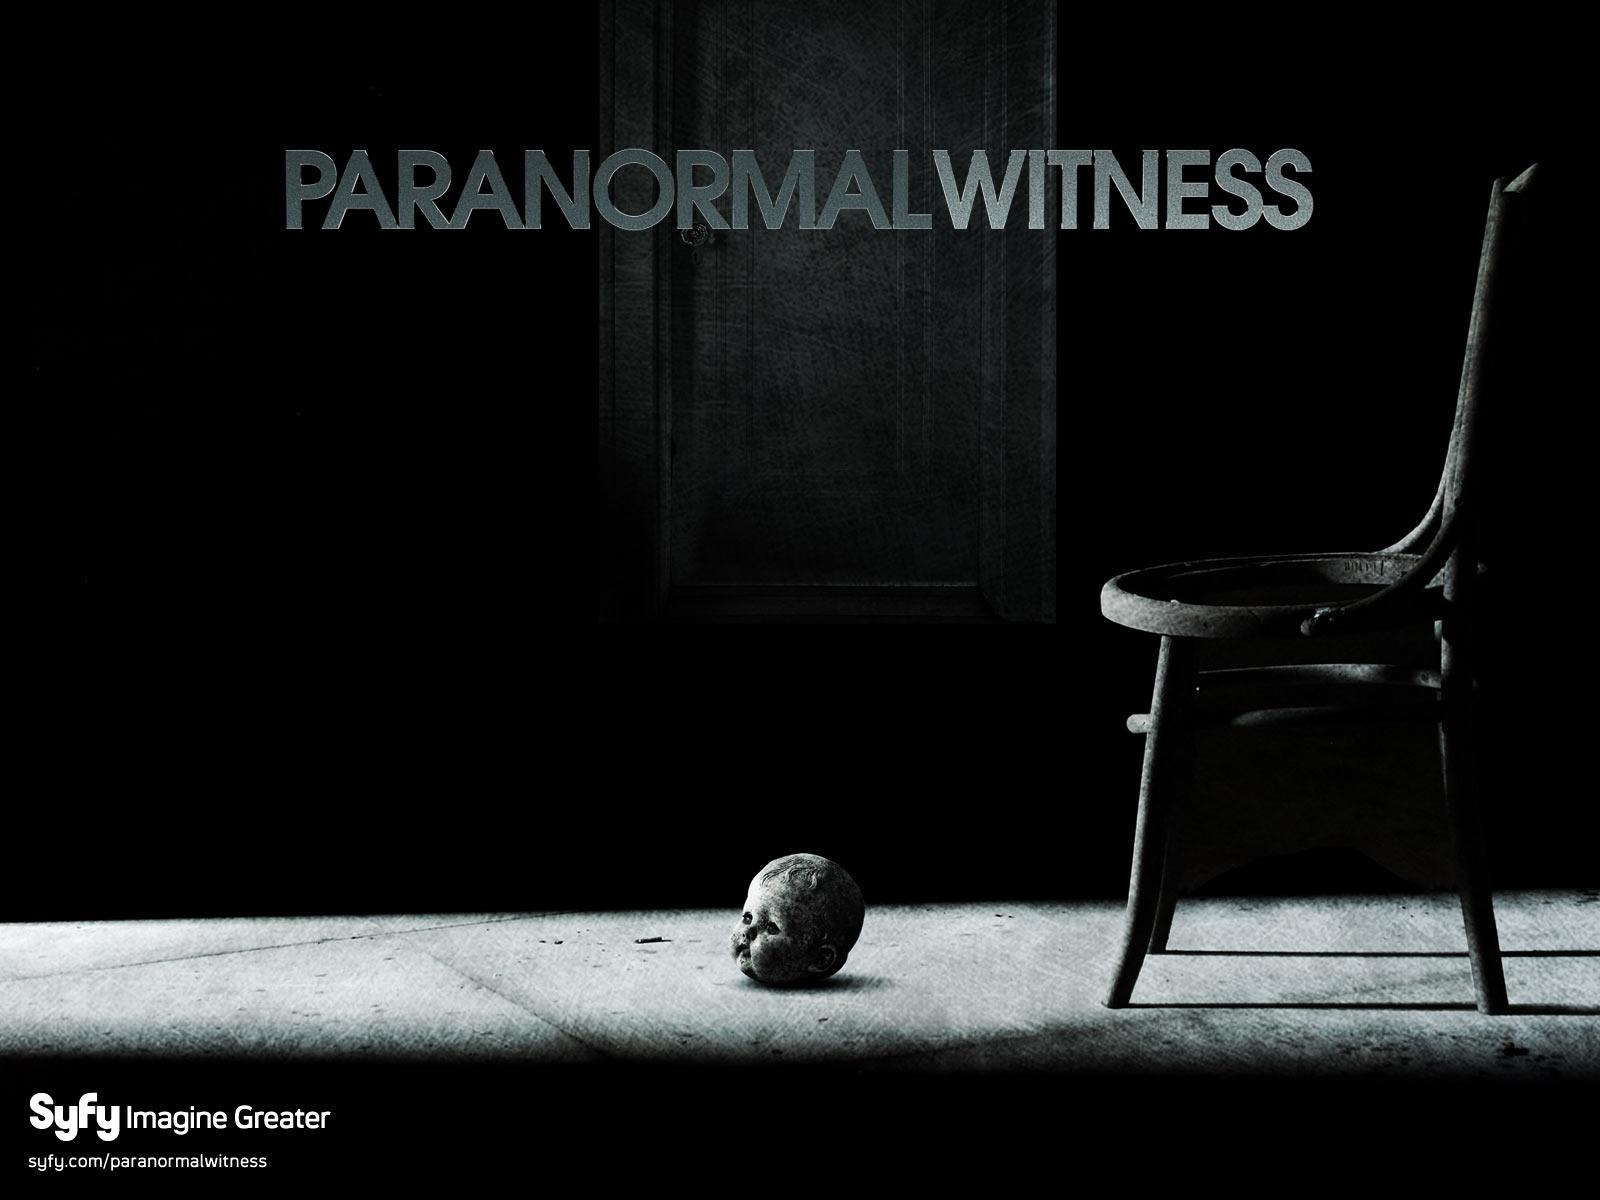 paranormalwitness_keyart5_1600_131420975899